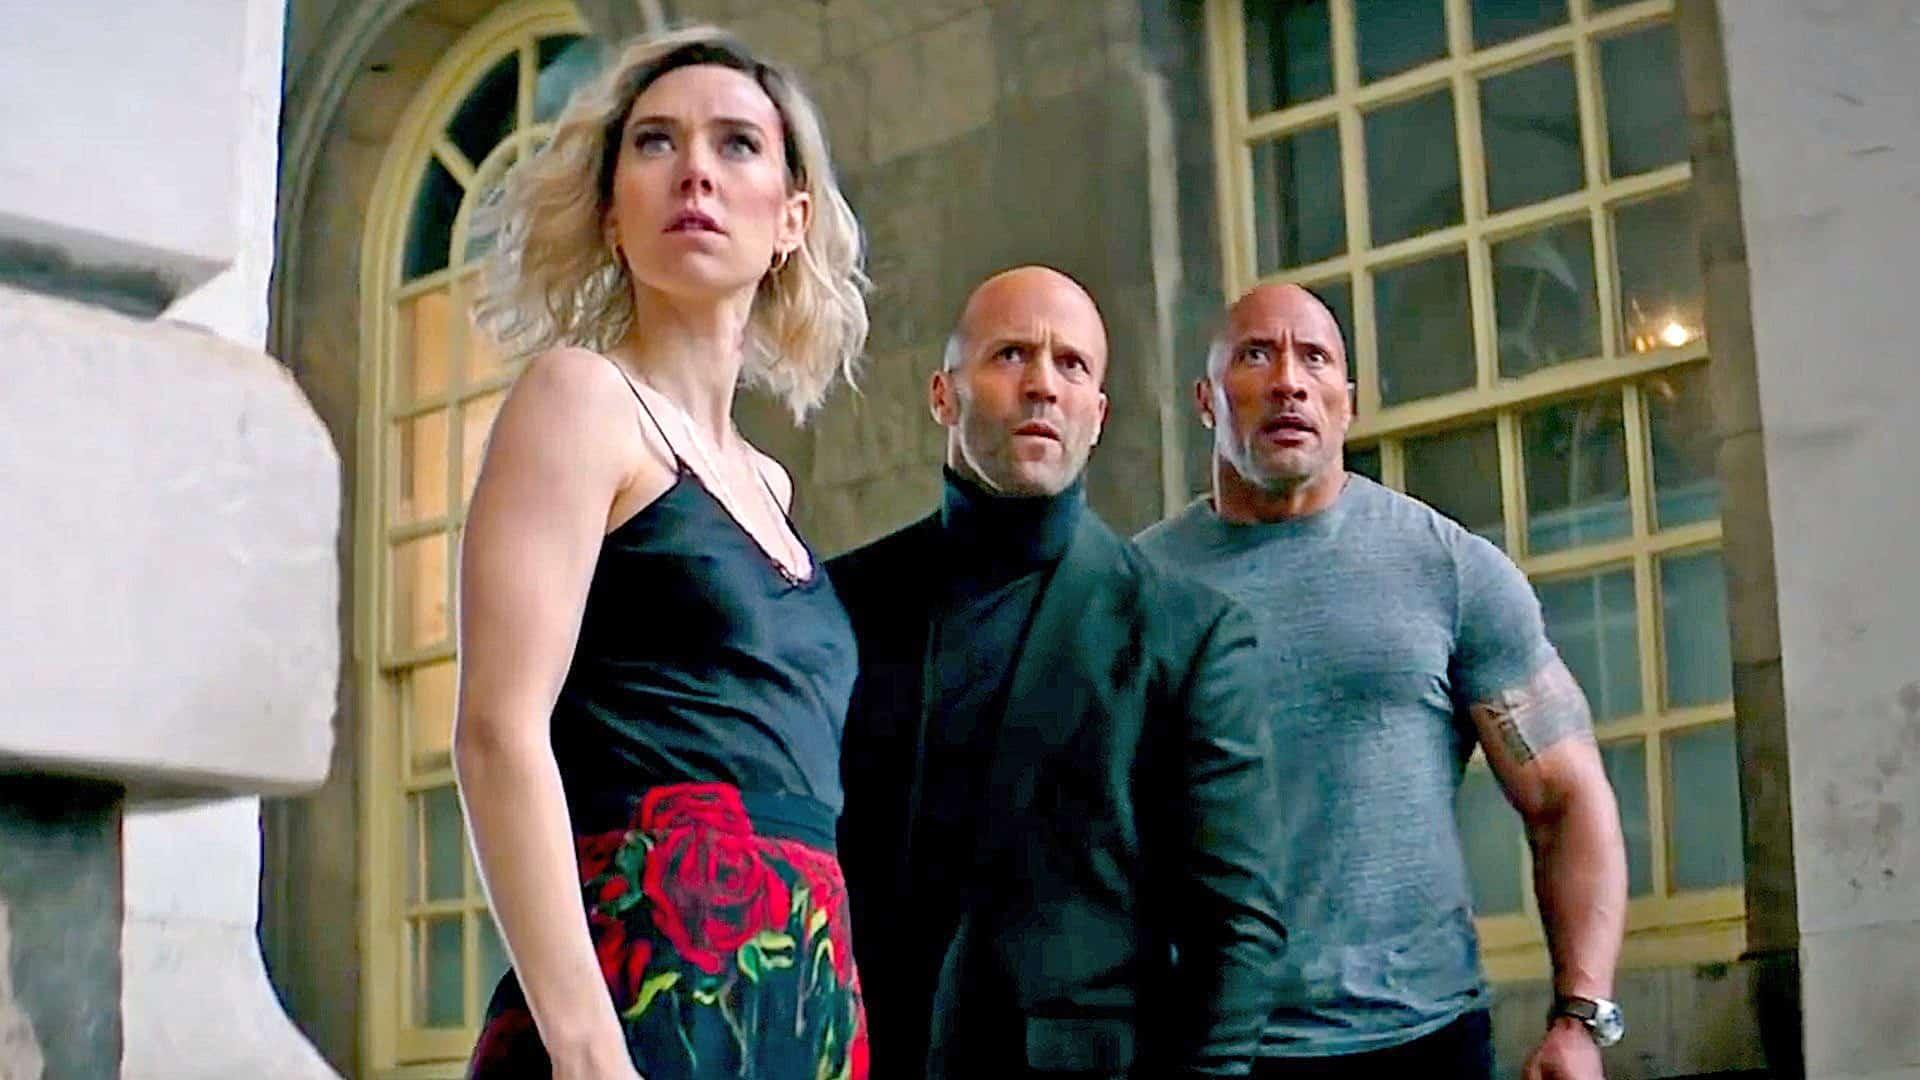 Hobbs & Shaw 2 Dwayne Johnson Jason Statham Fast & Furious spin-off